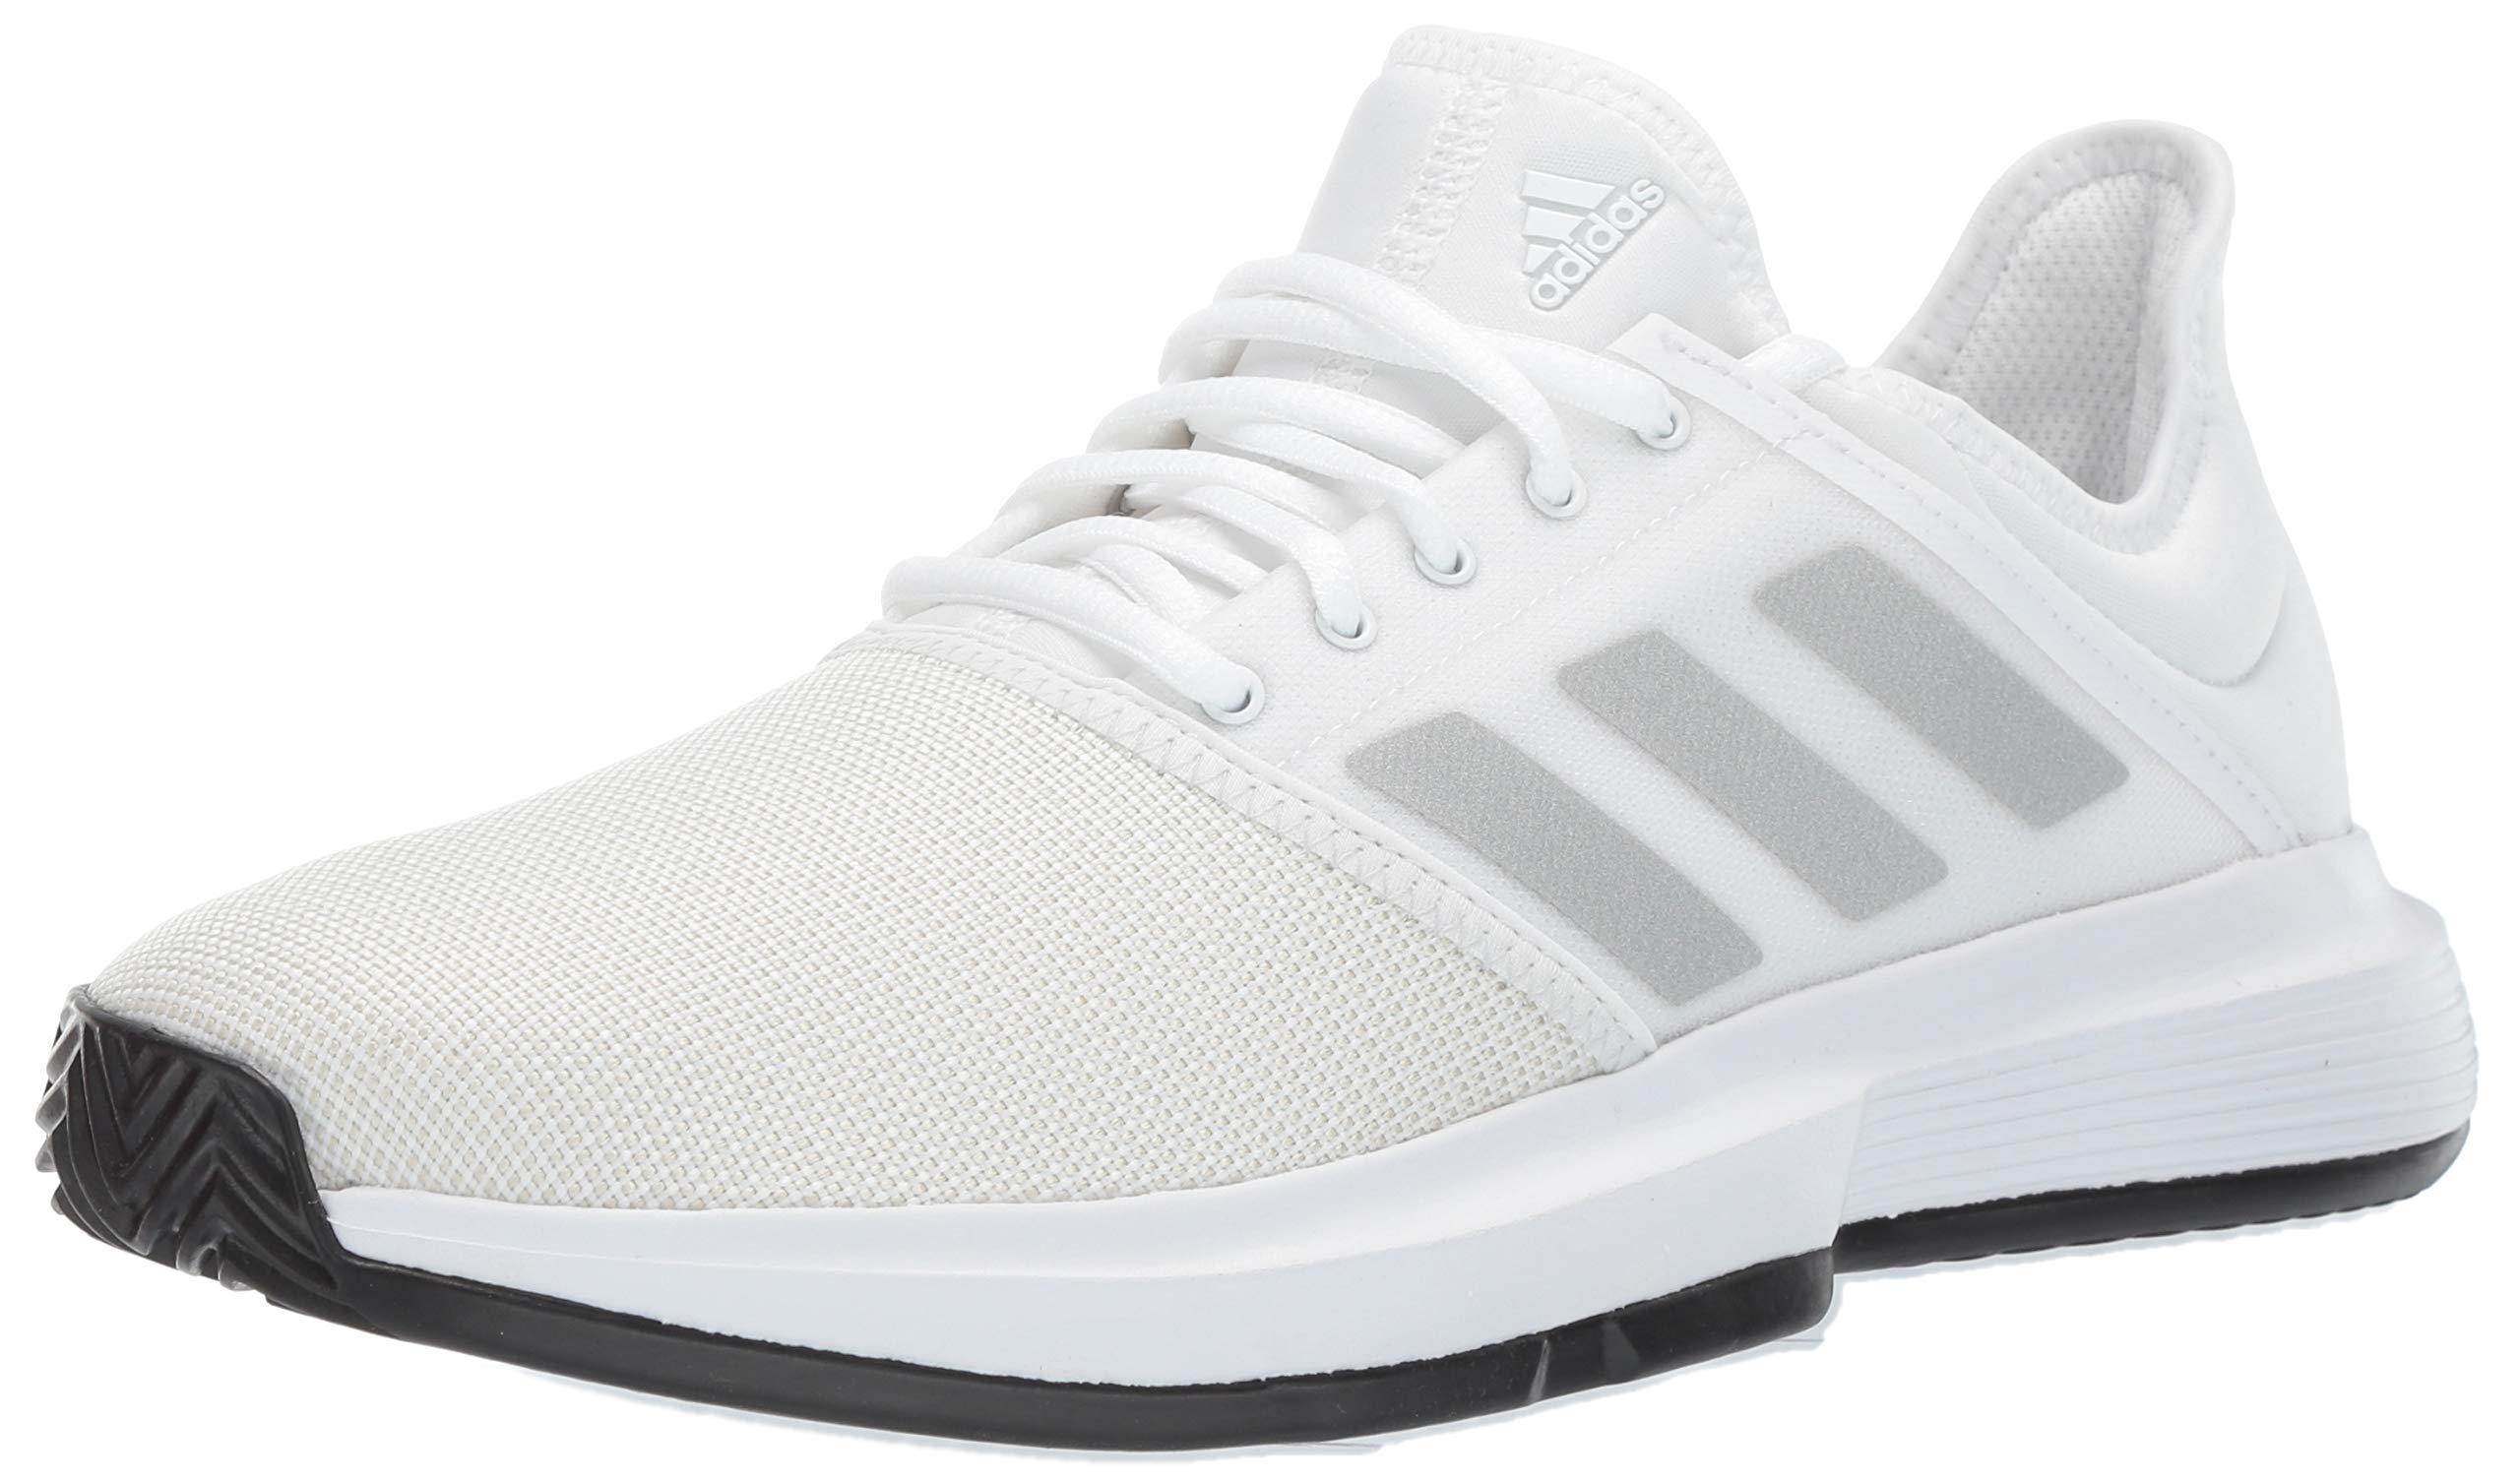 adidas Men's Gamecourt, White/Matte Silver/Black, 7.5 M US by adidas (Image #1)